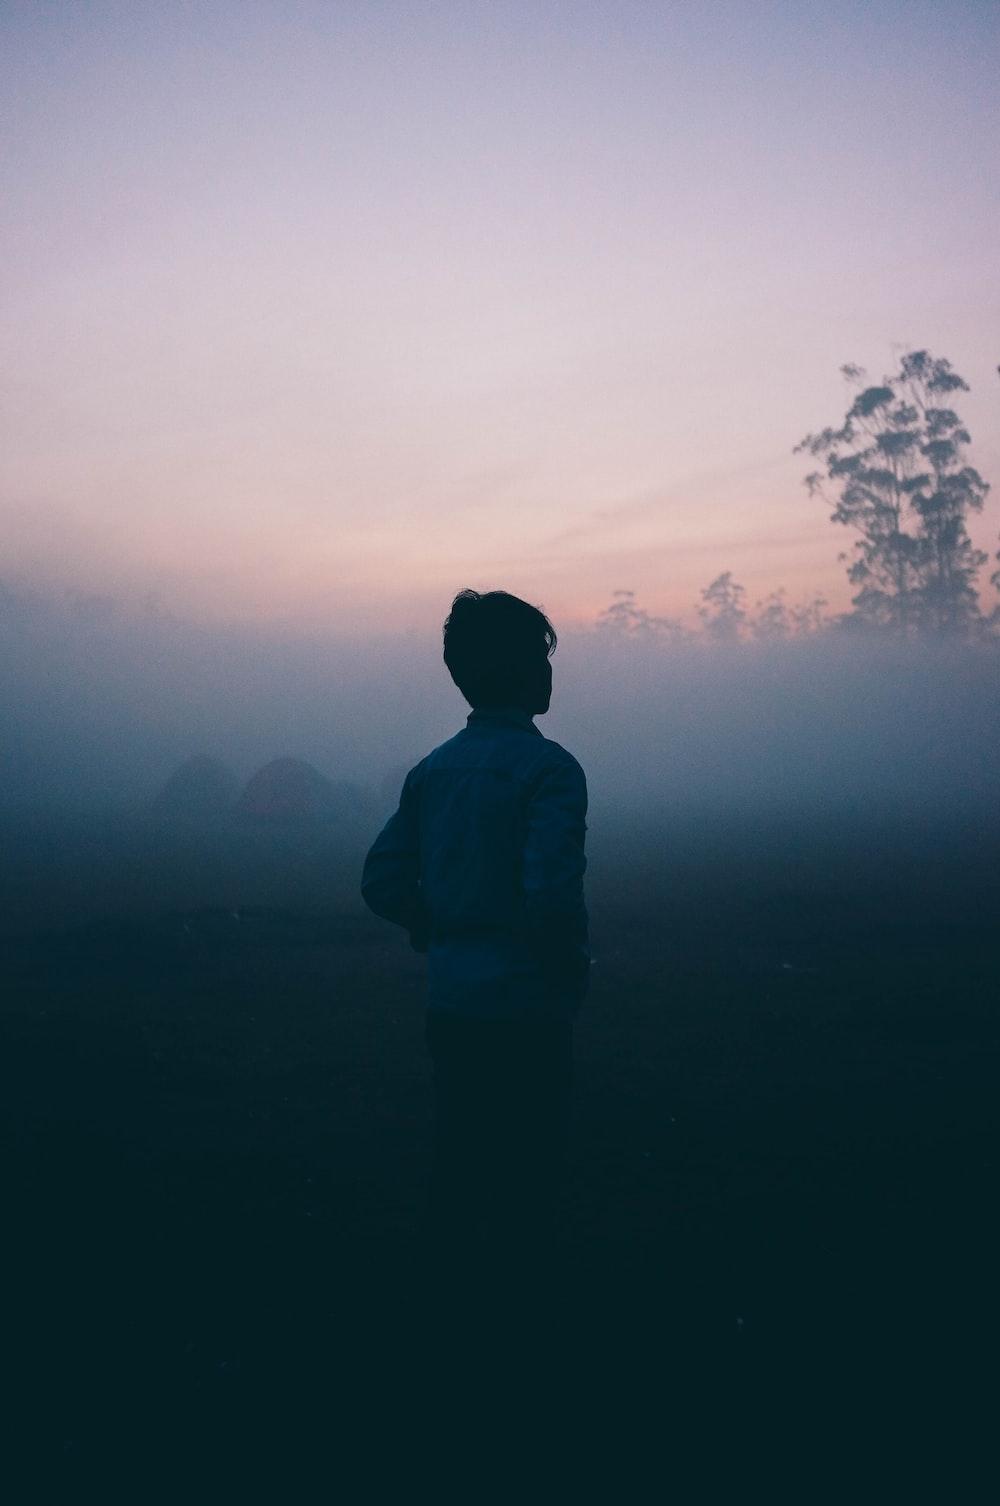 a man walks alone in the haze